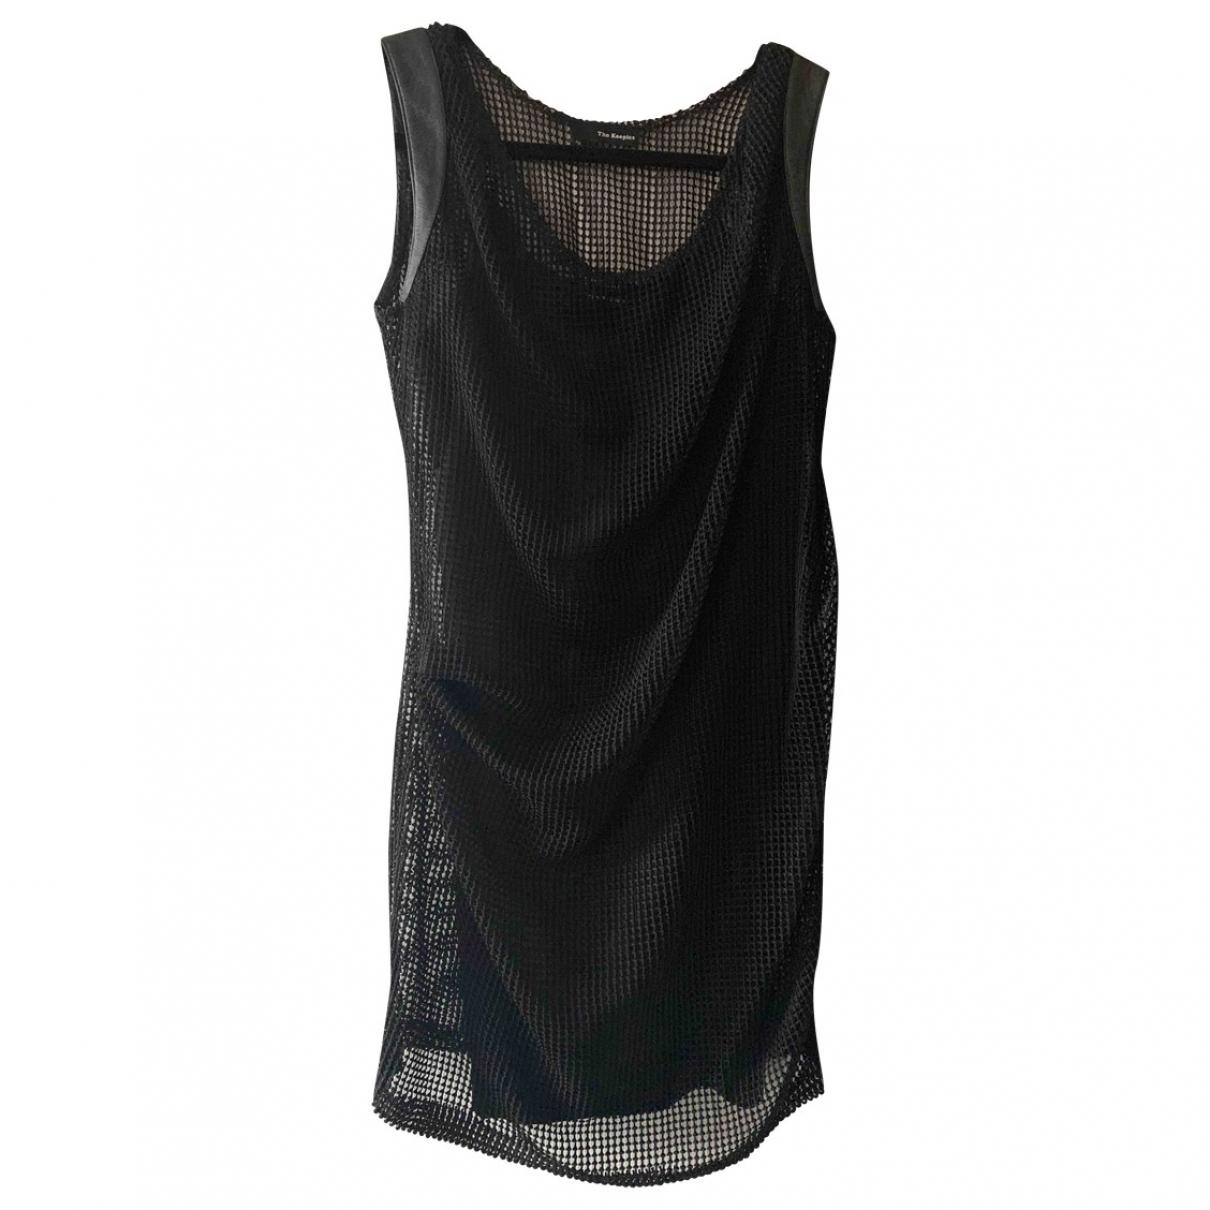 The Kooples \N Black dress for Women 36 FR